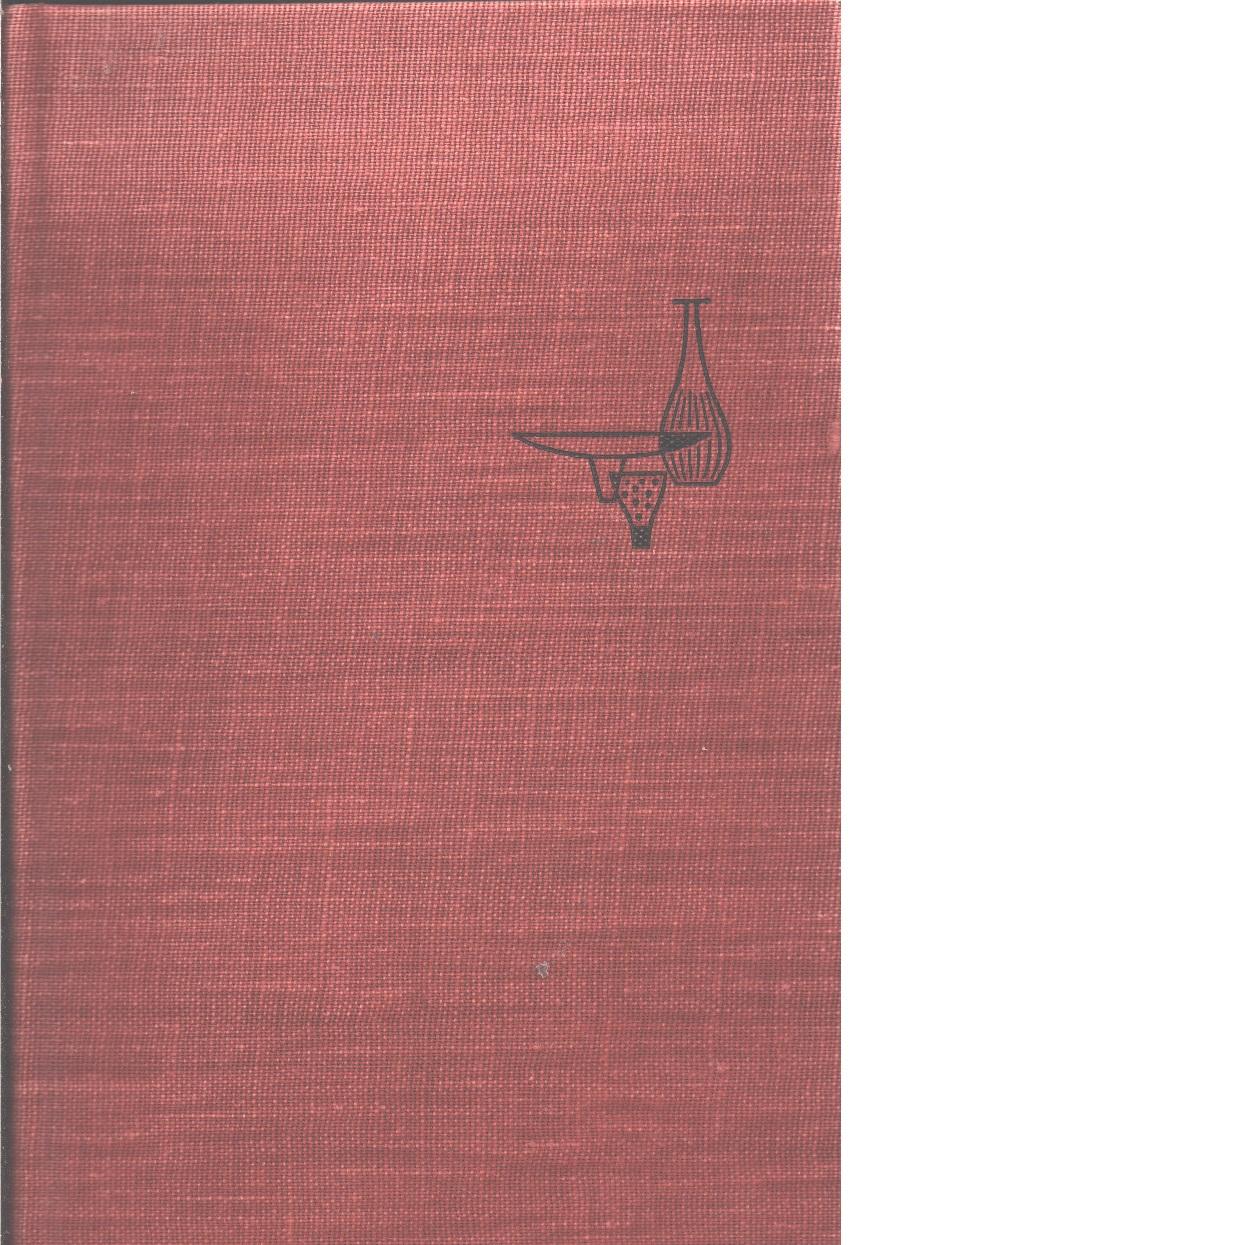 Keramikhandboken - Boije Af Gennäs, Madeleine Och Lidbeck, Bull